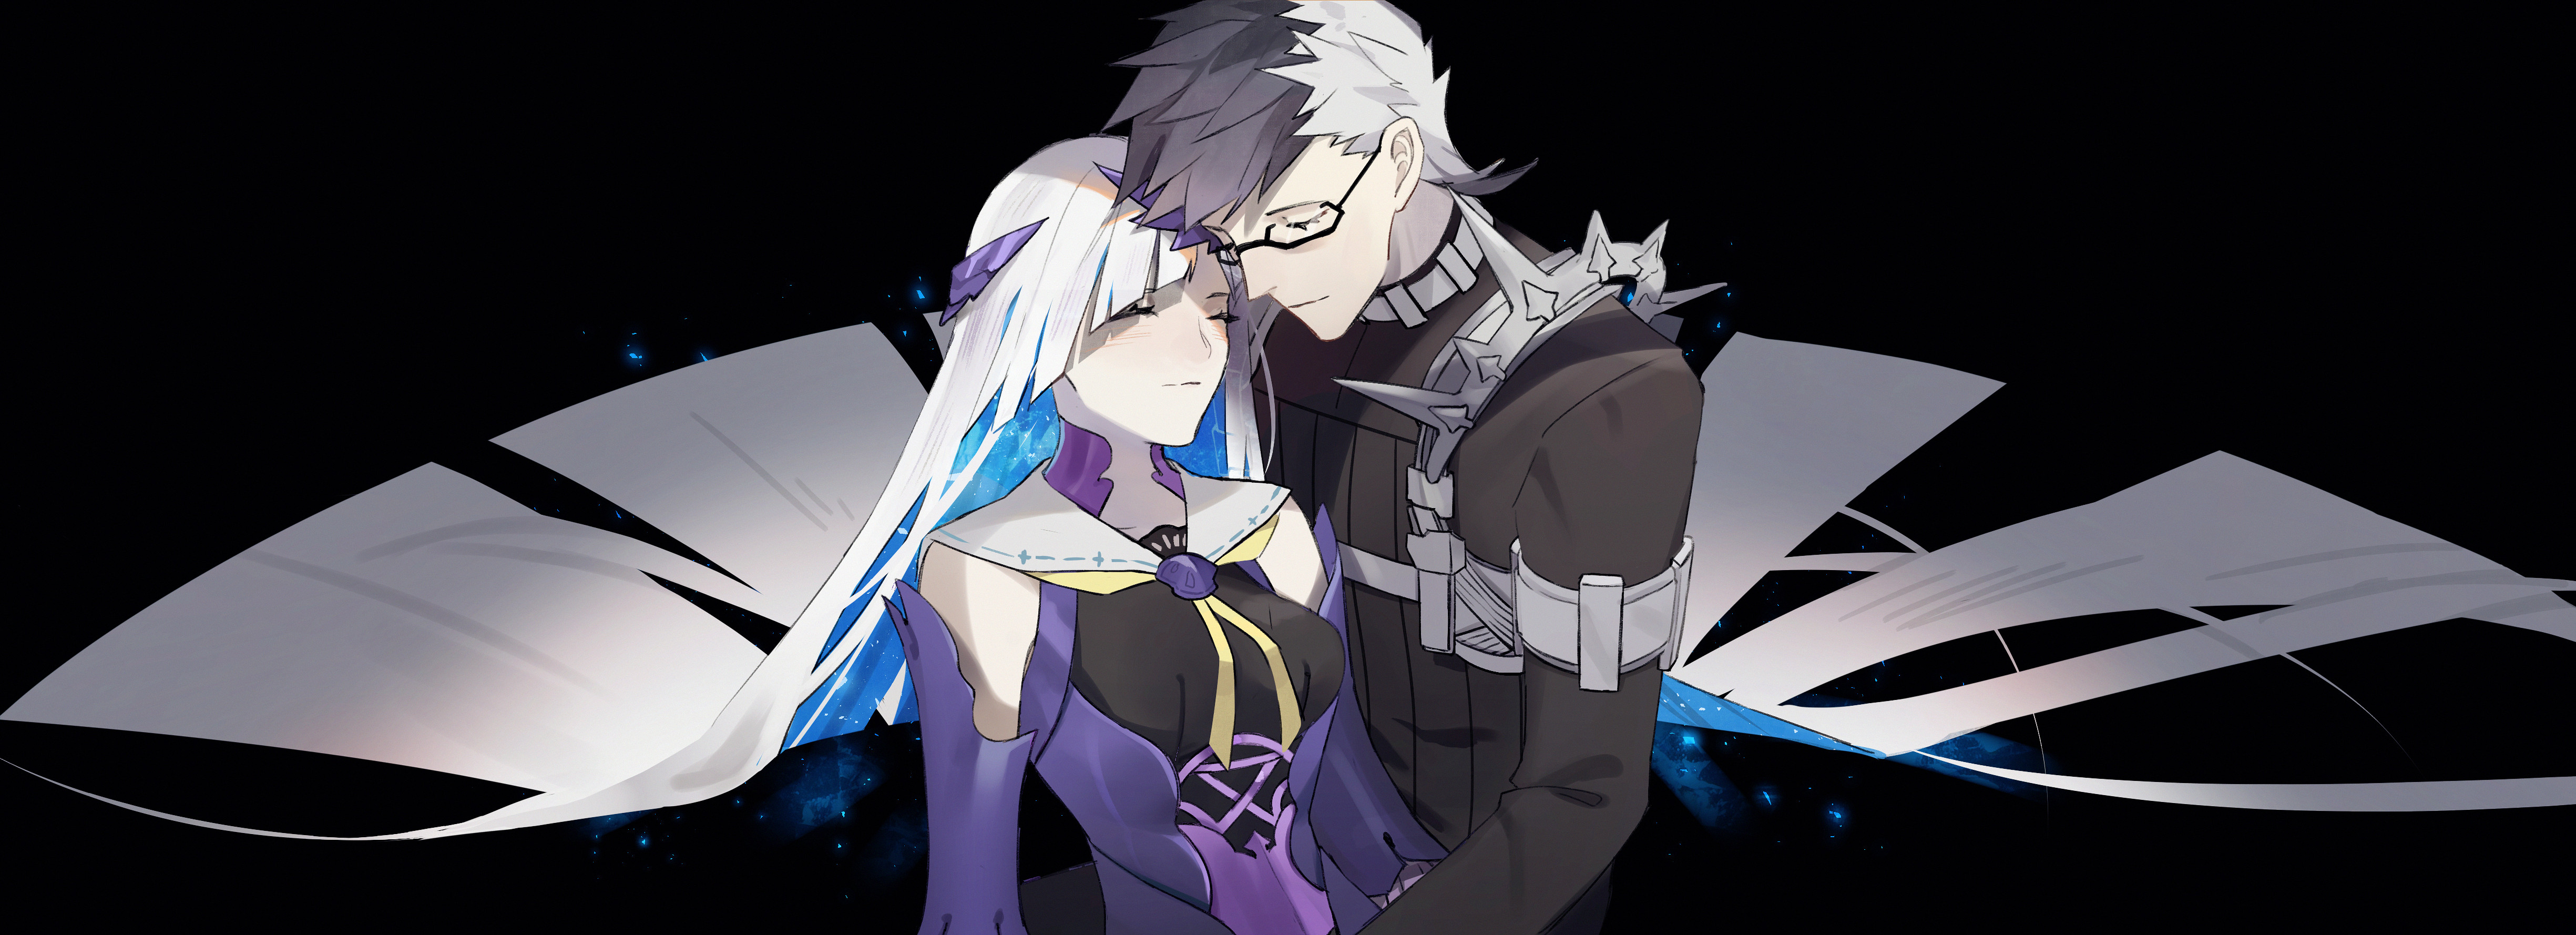 Saber (Sigurd) - Fate/Grand Order - Zerochan Anime Image Board